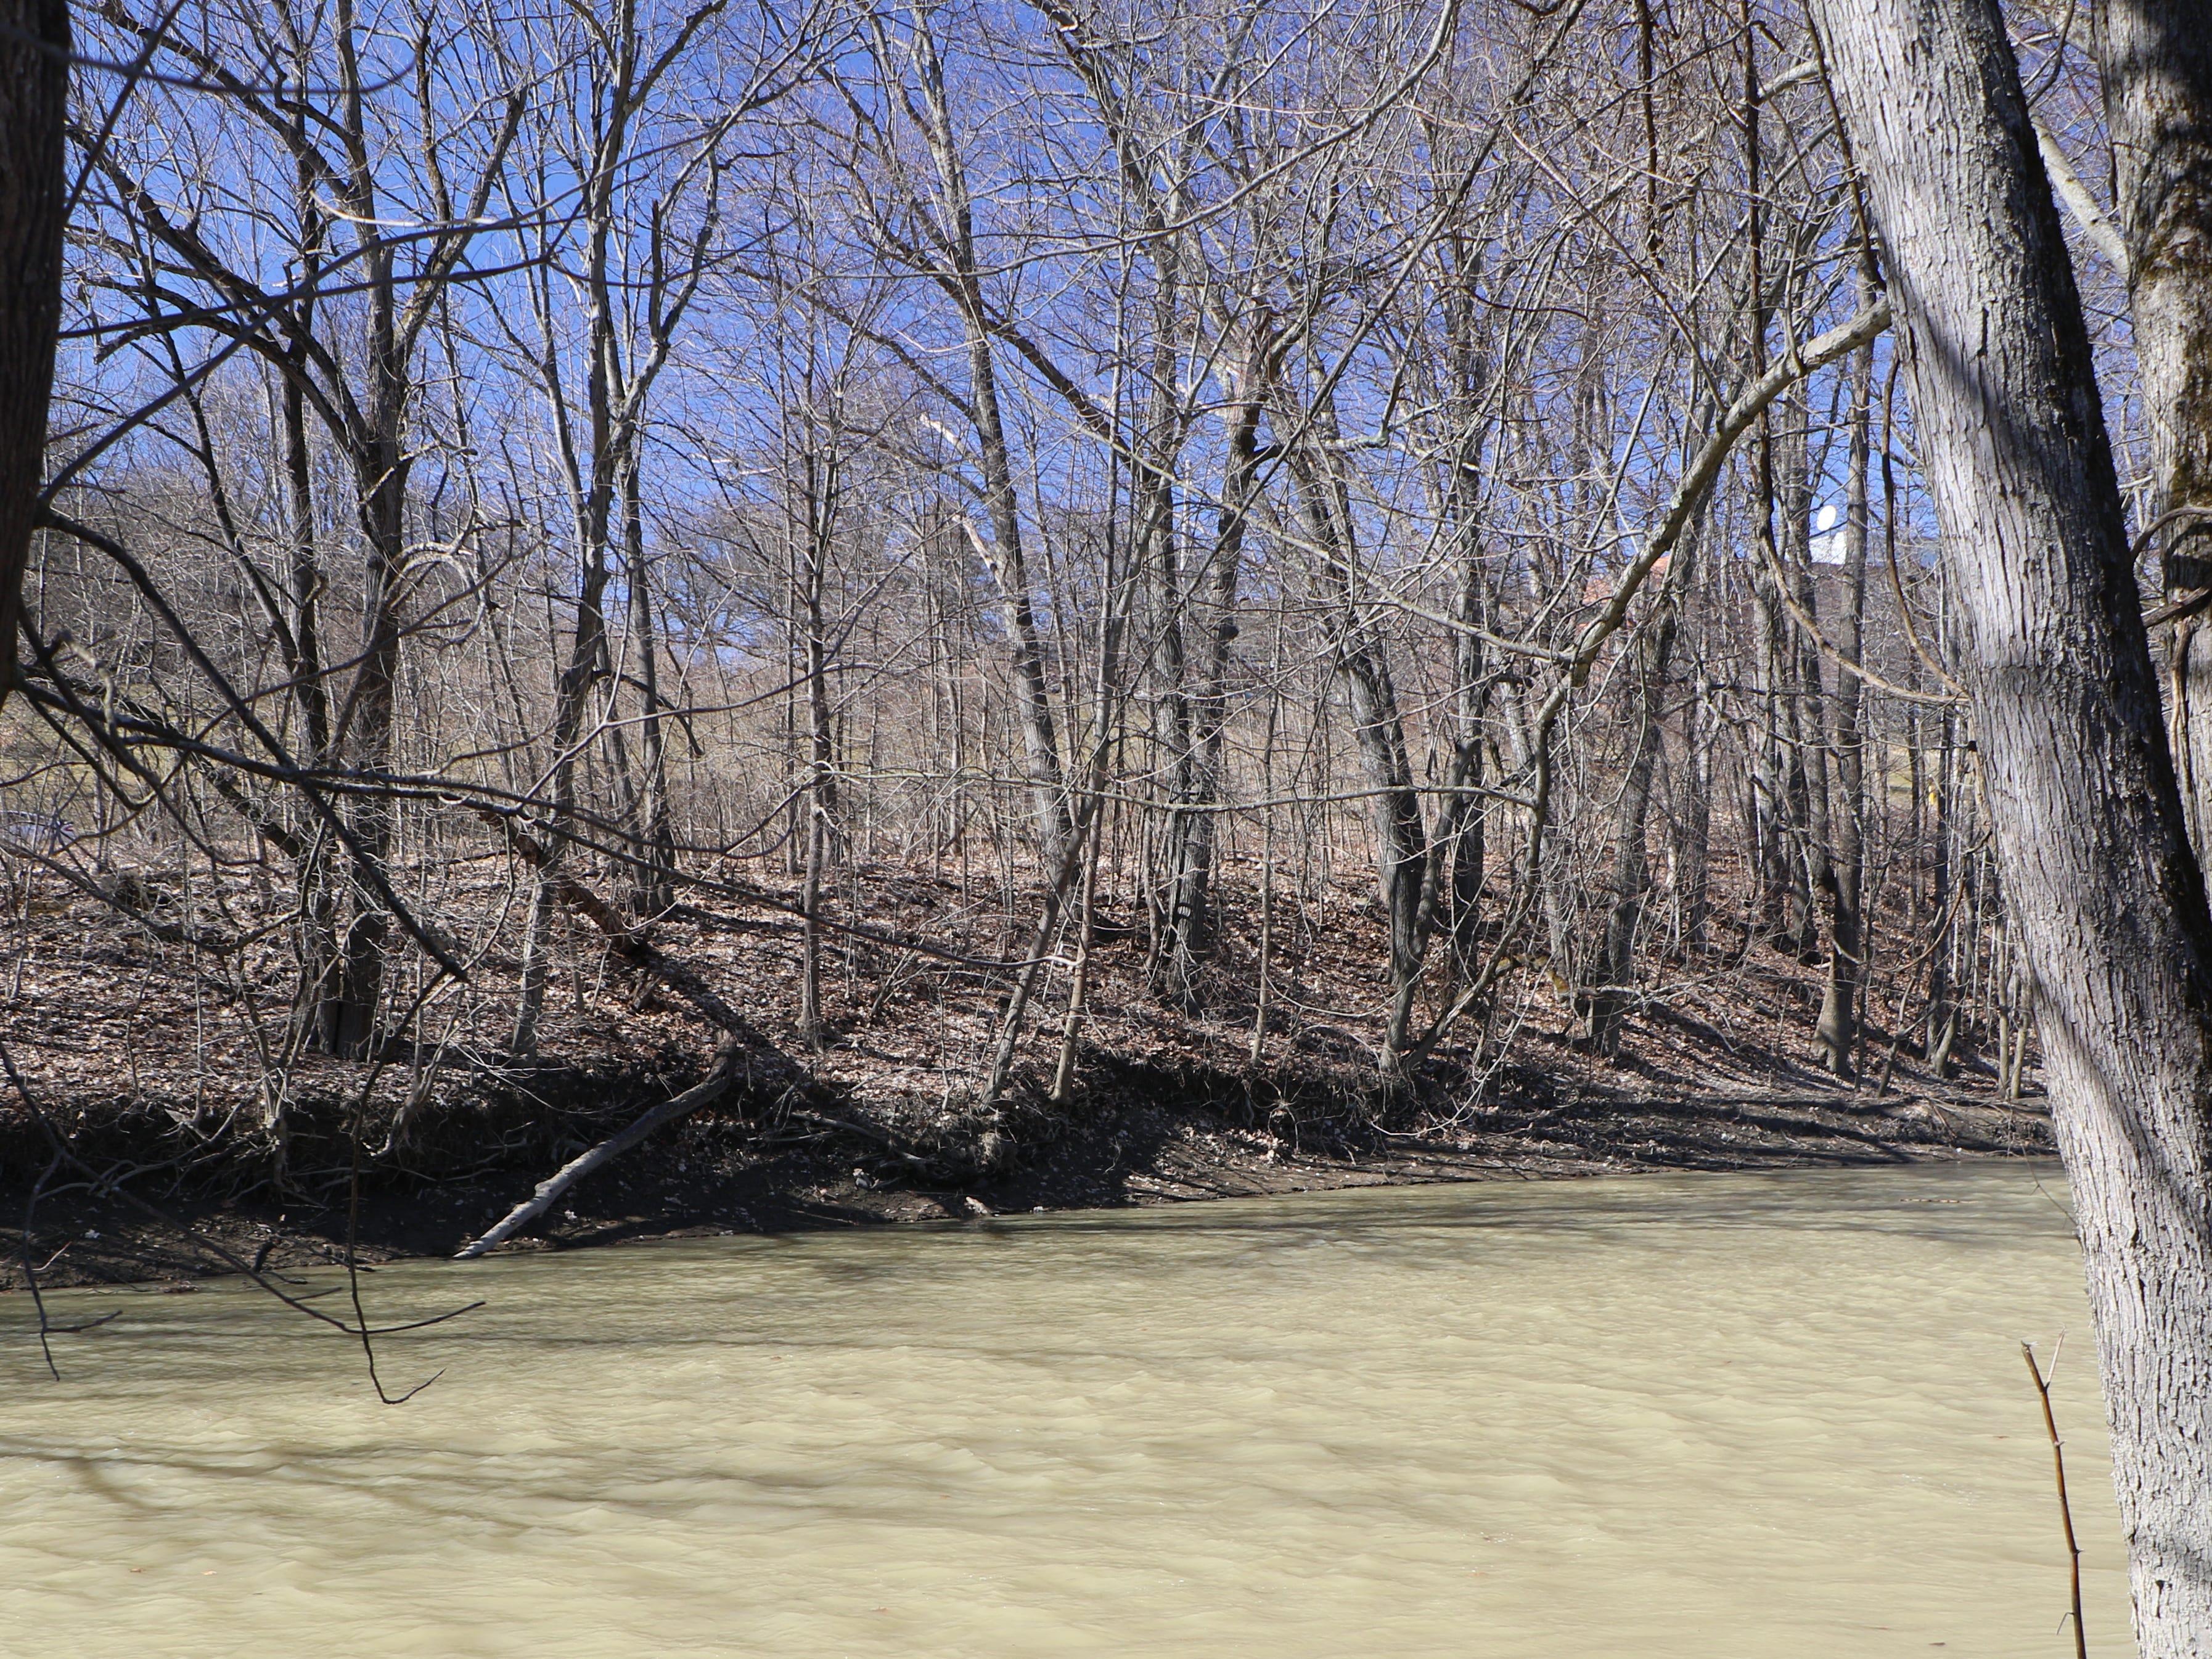 A shot of Nanticoke Creek.